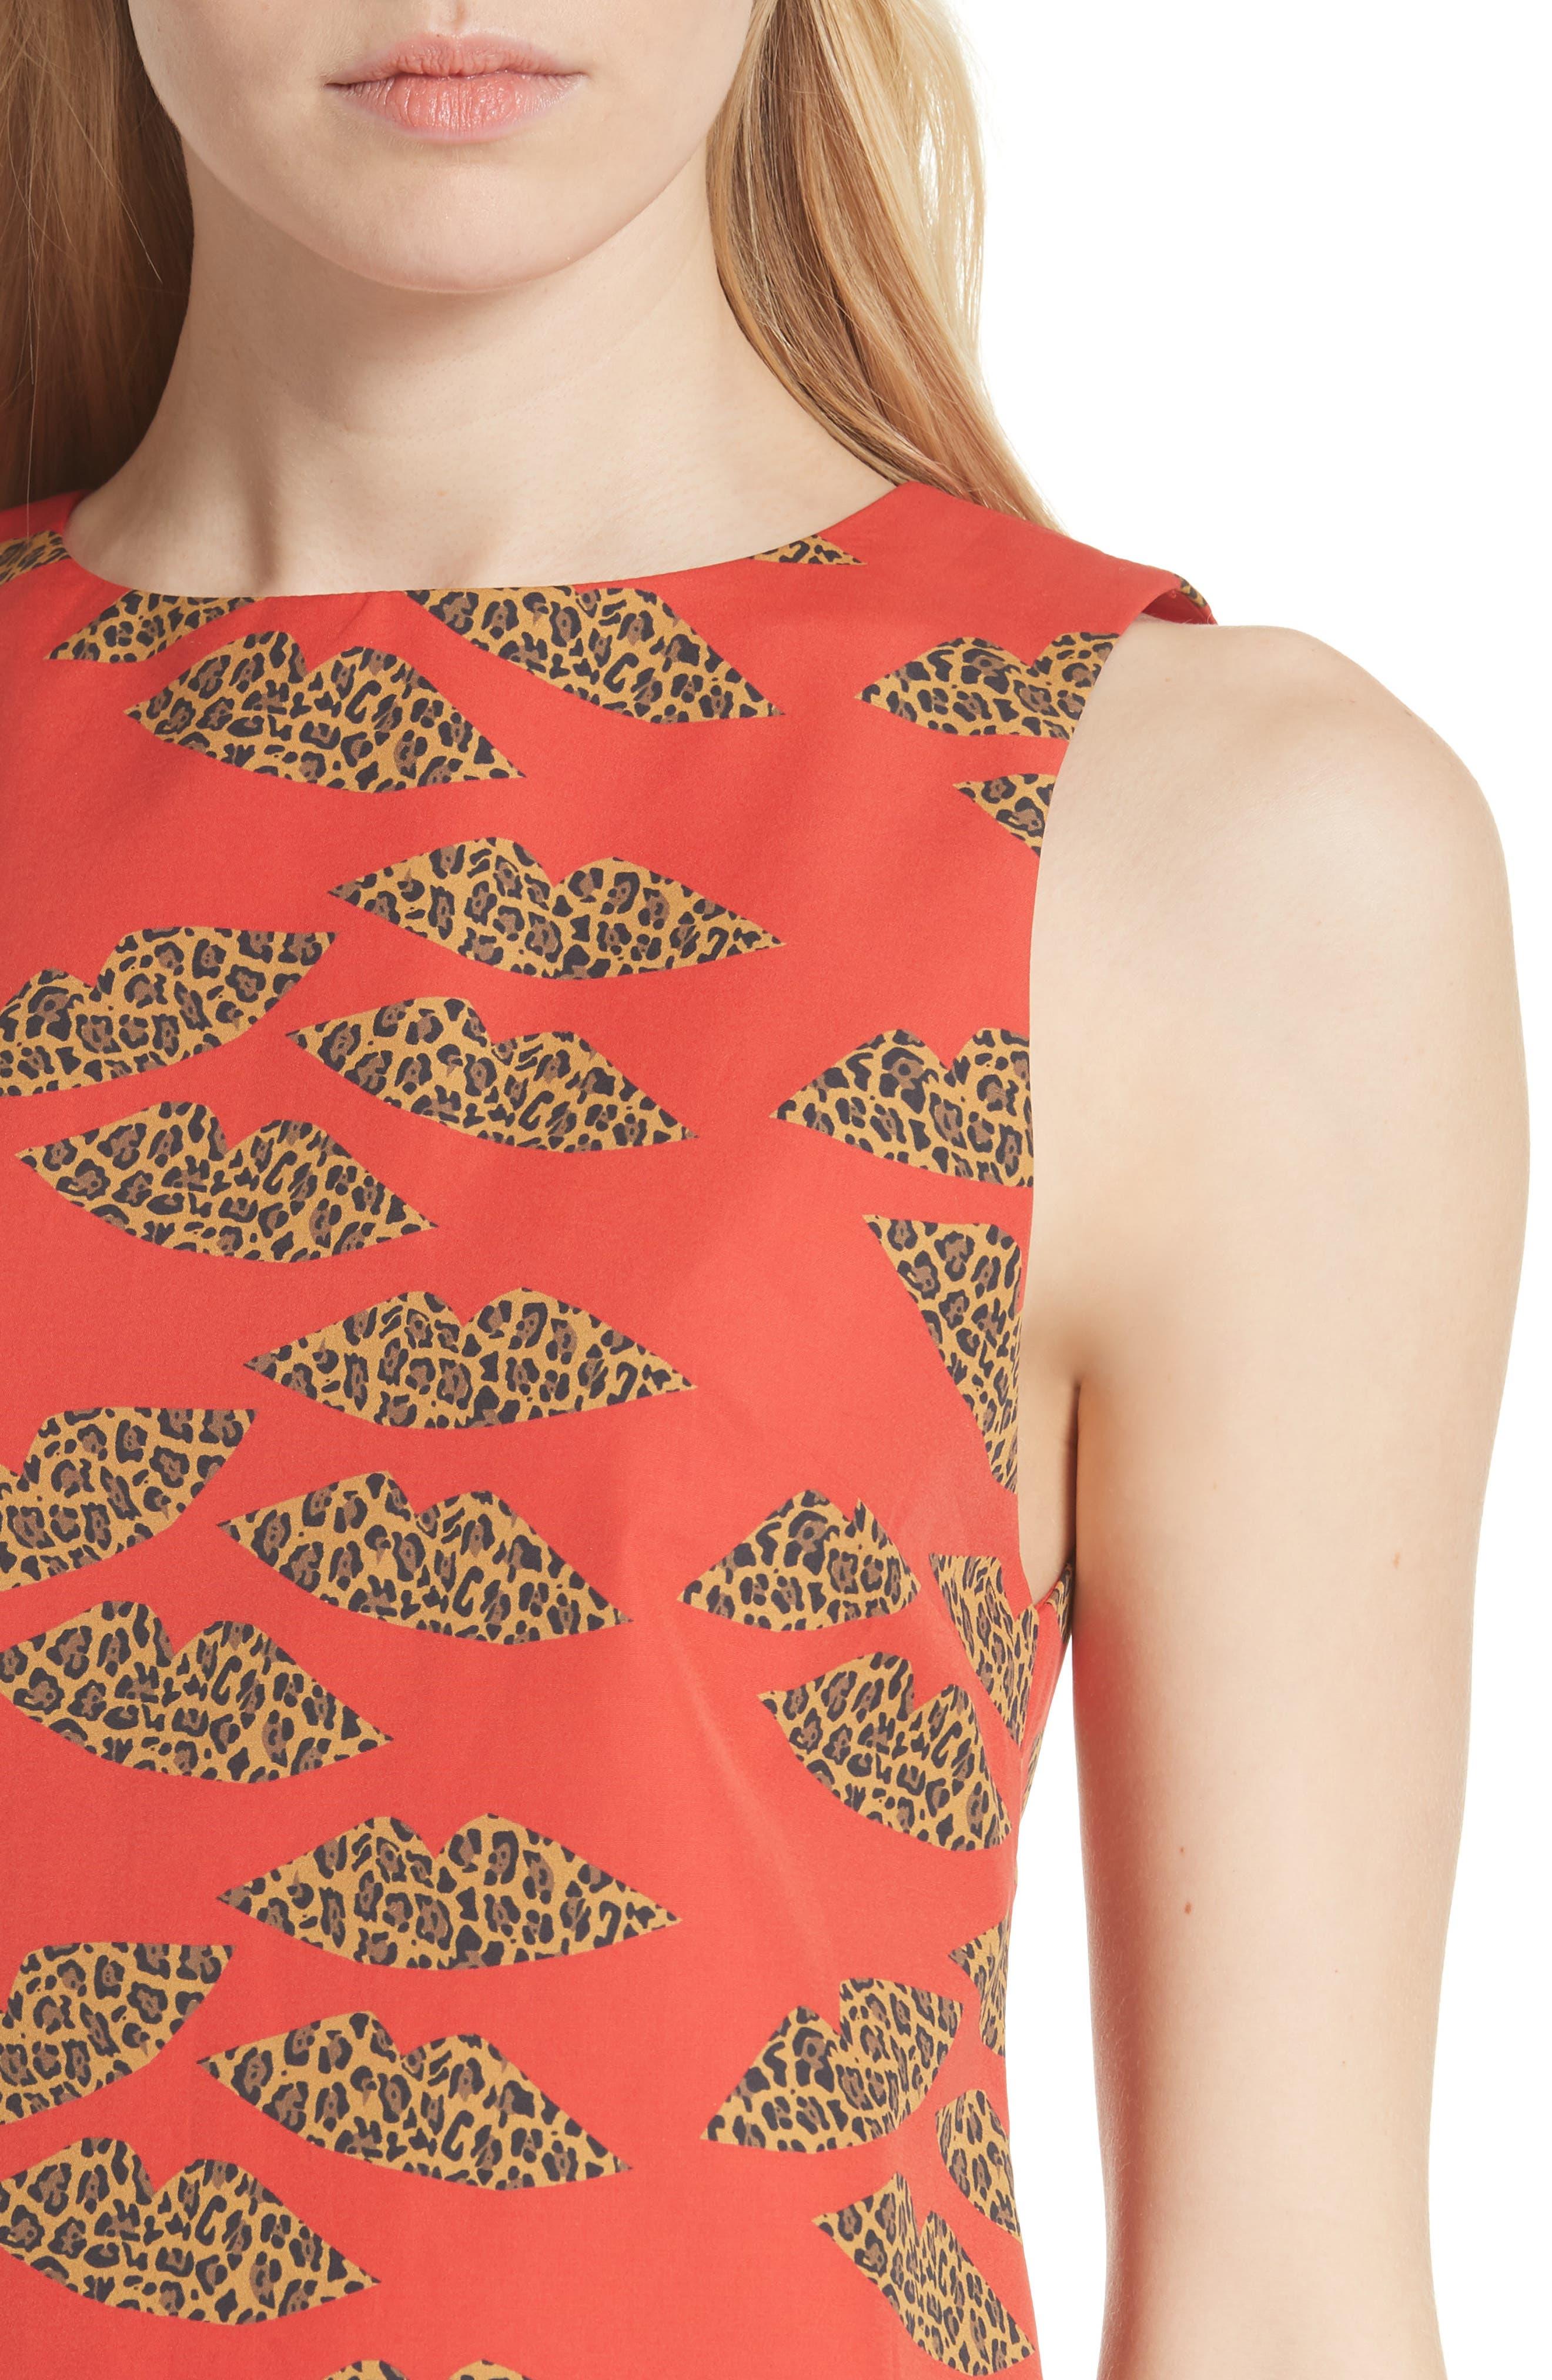 Clyde Cotton Shift Dress,                             Alternate thumbnail 4, color,                             Cheetah